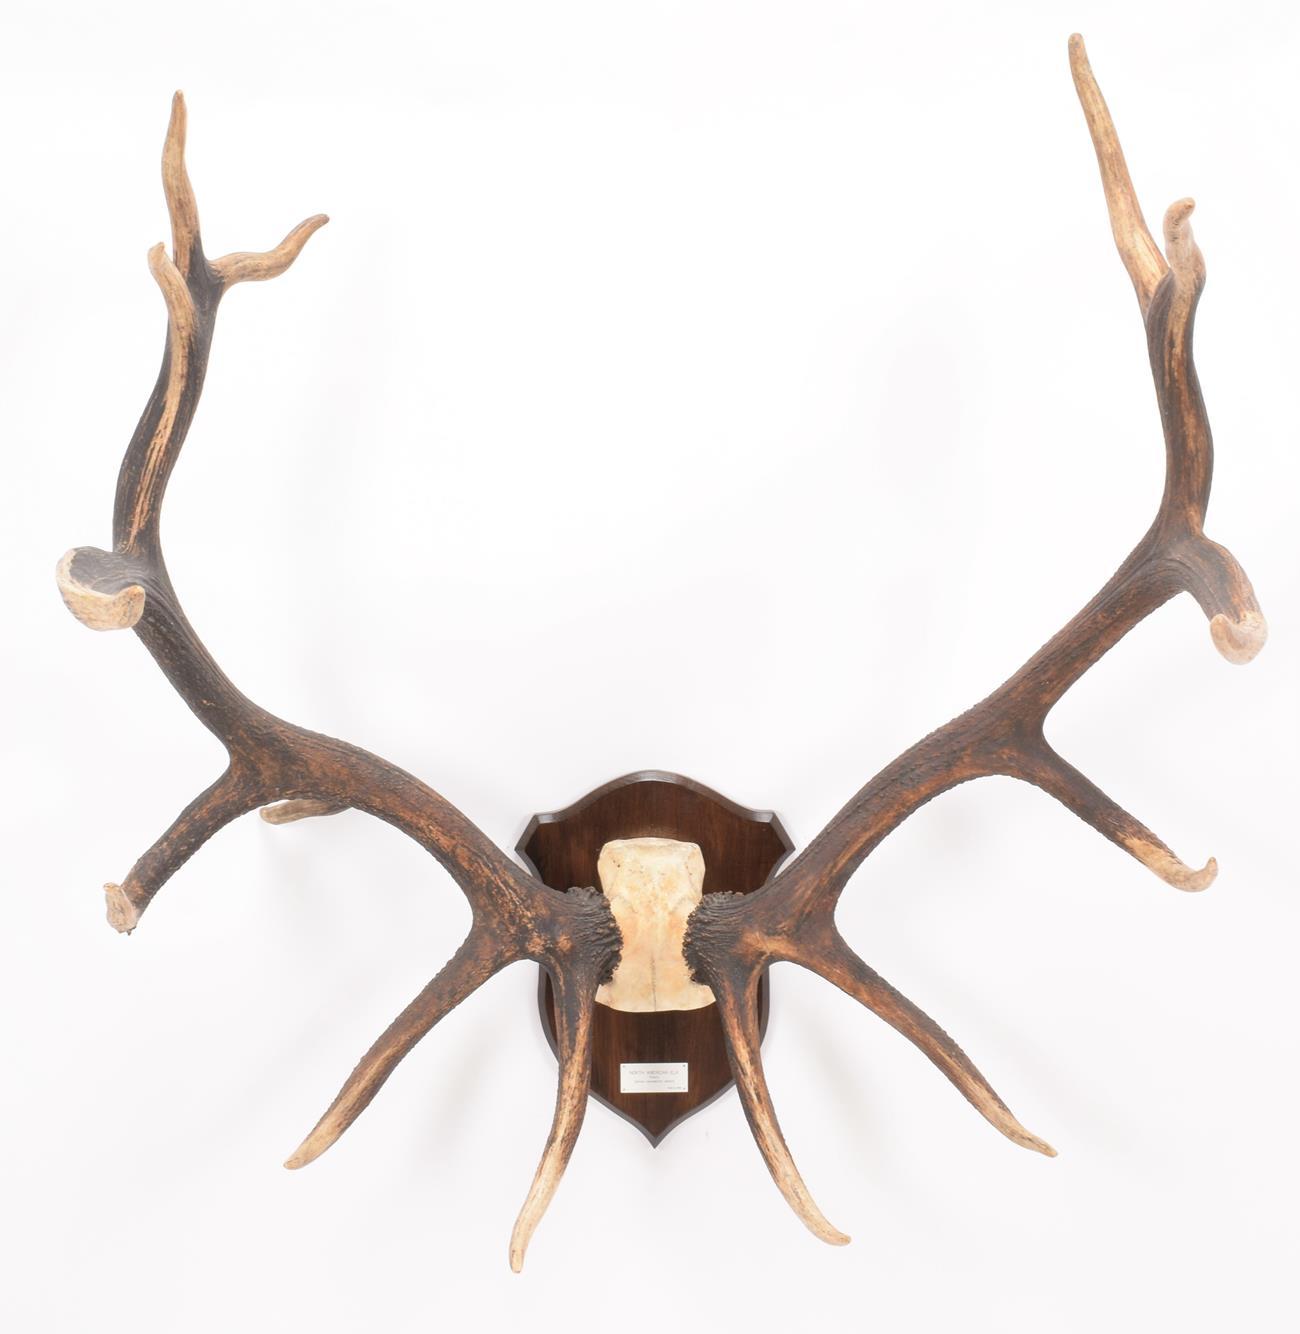 Antlers/Horns: North American Wapiti or Elk (Cervus canadensis nelsoni), North America, a very large